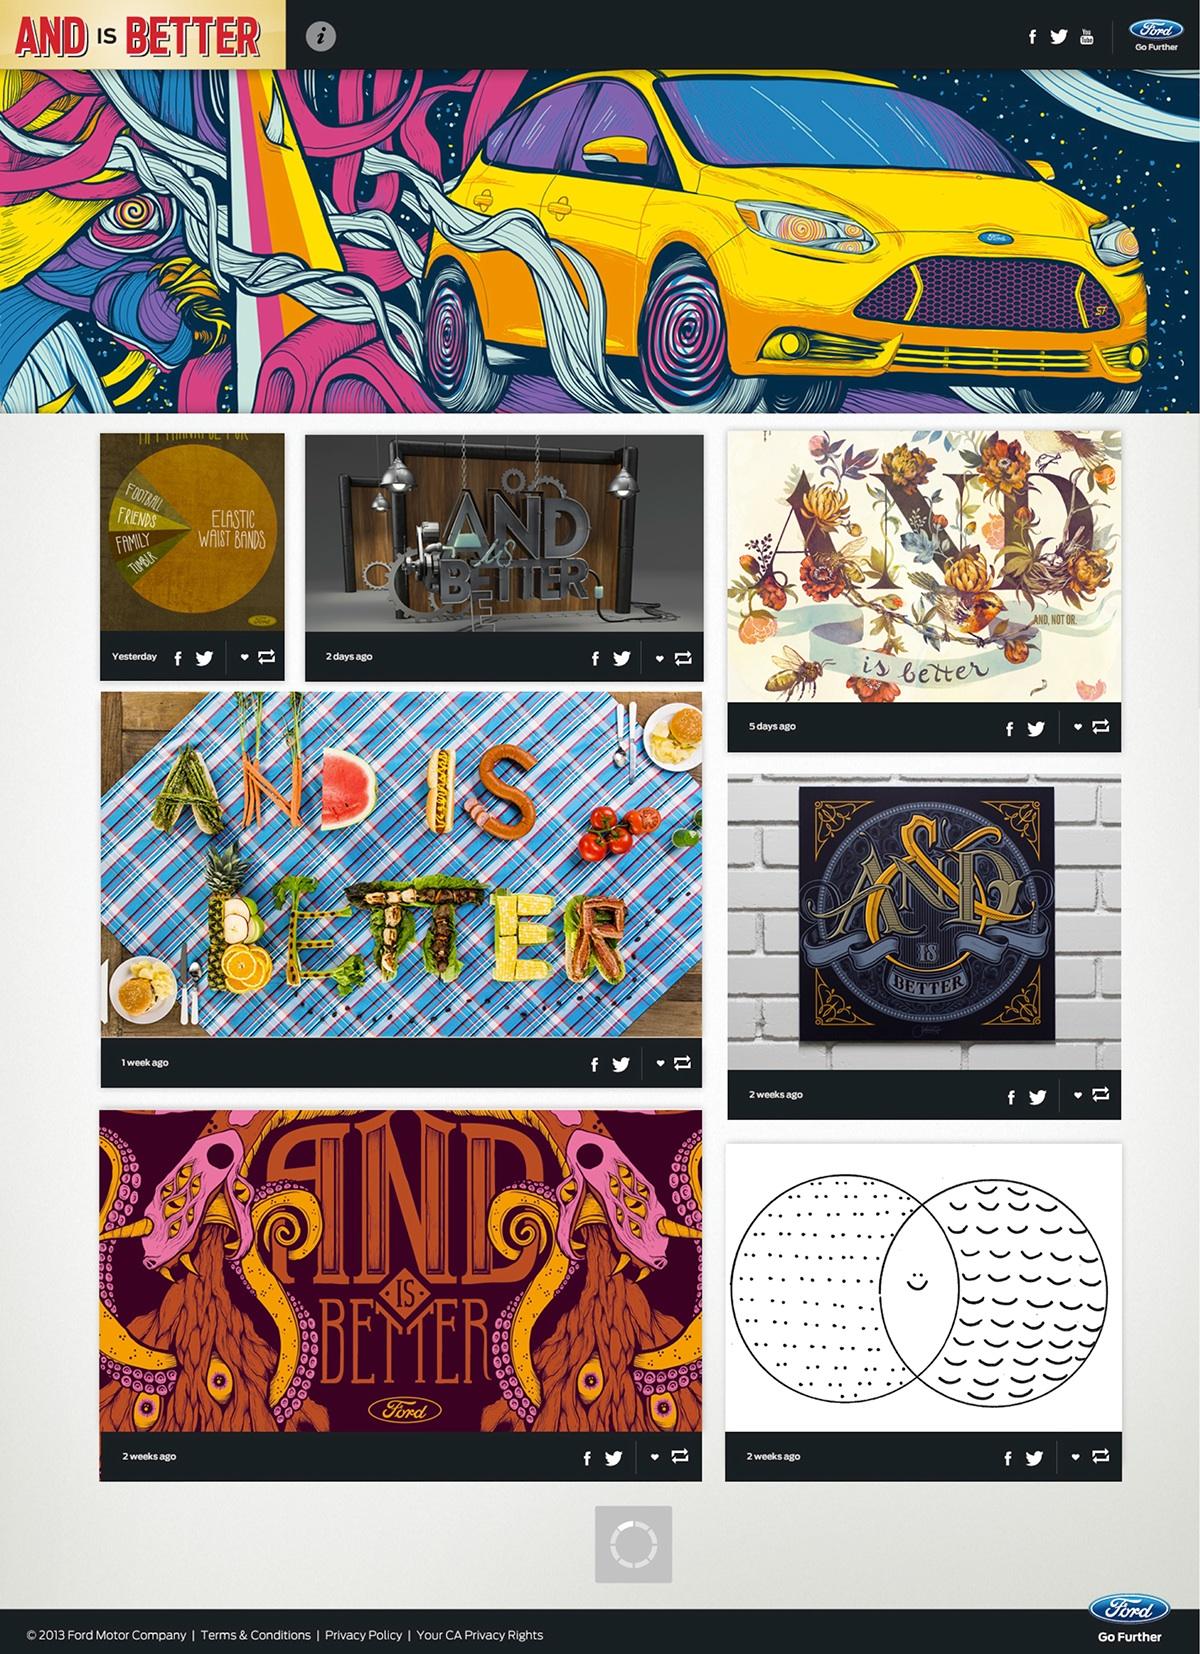 social tumblr adage design venn cinemagraph artists content generation Ford content curration reblogs gif content